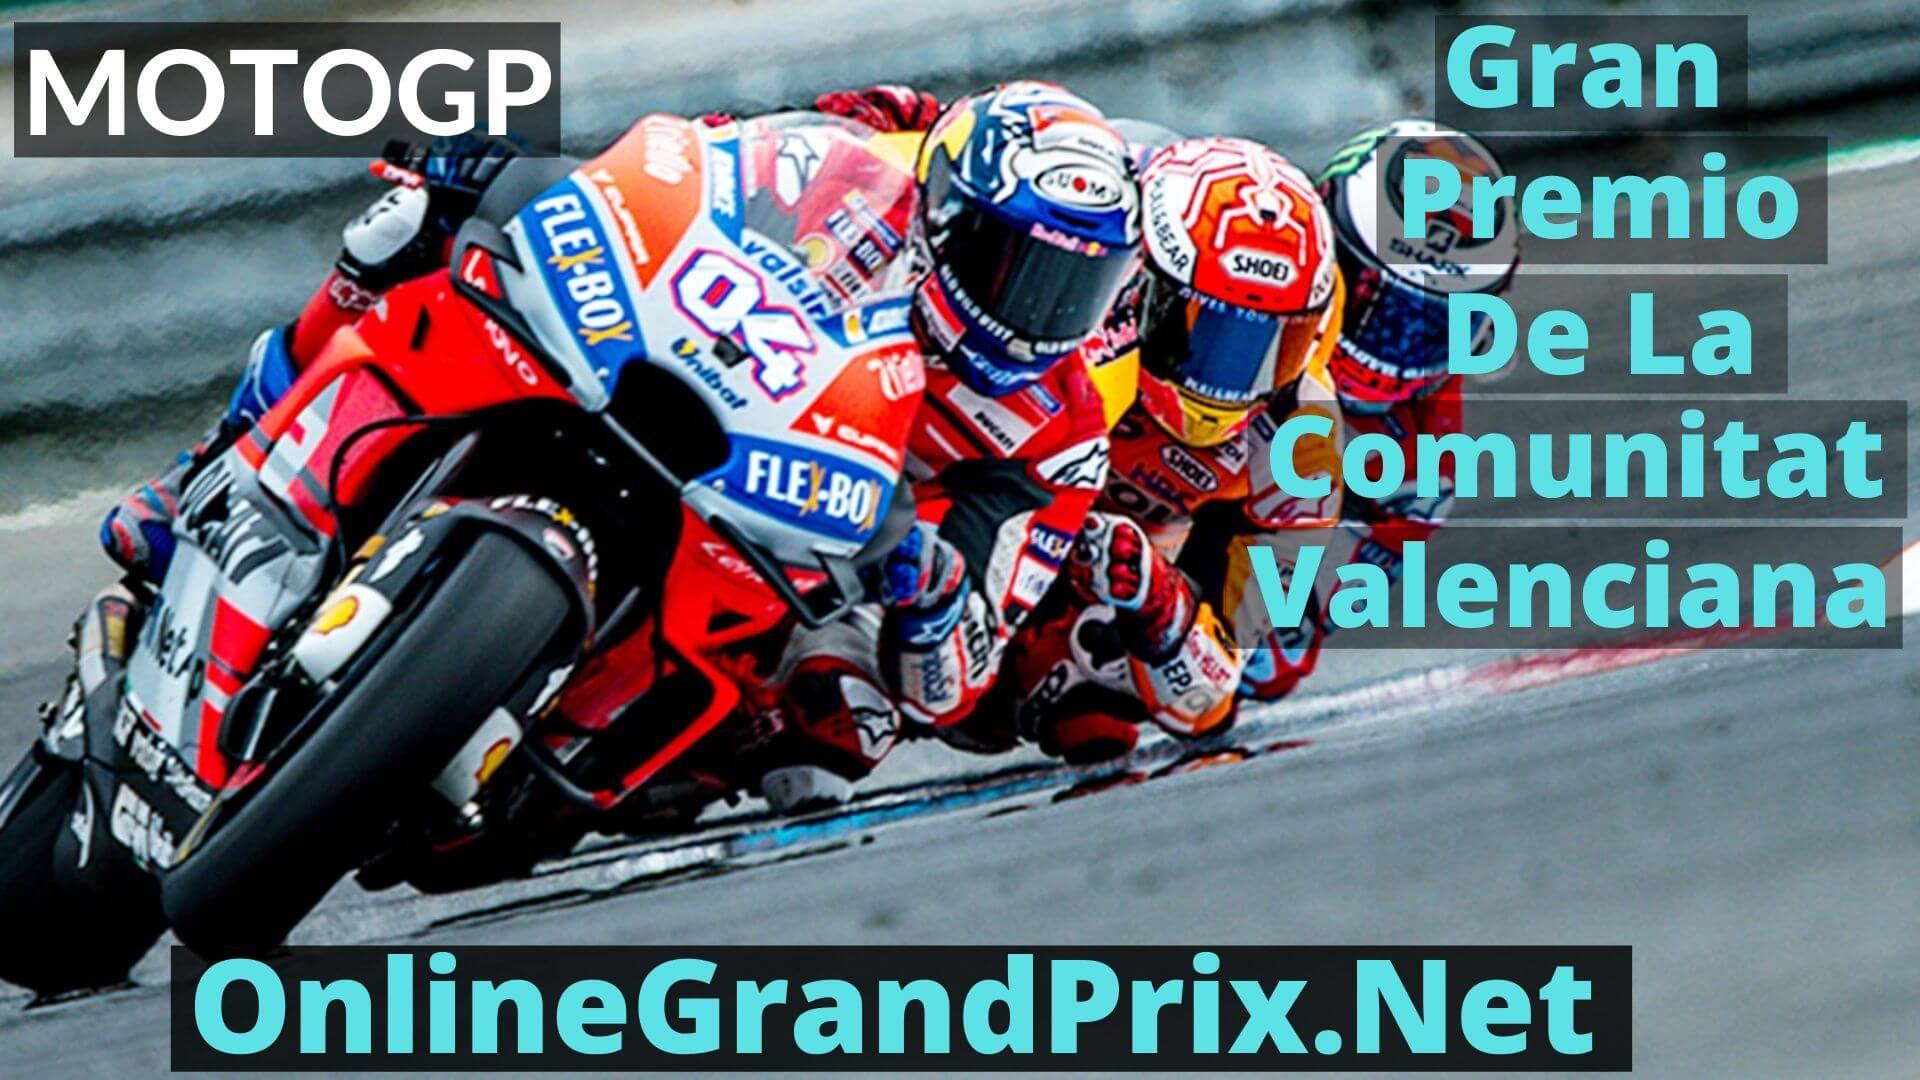 Gran Premio de la Comunitat Valenciana Live Stream 2020 | MotoGP